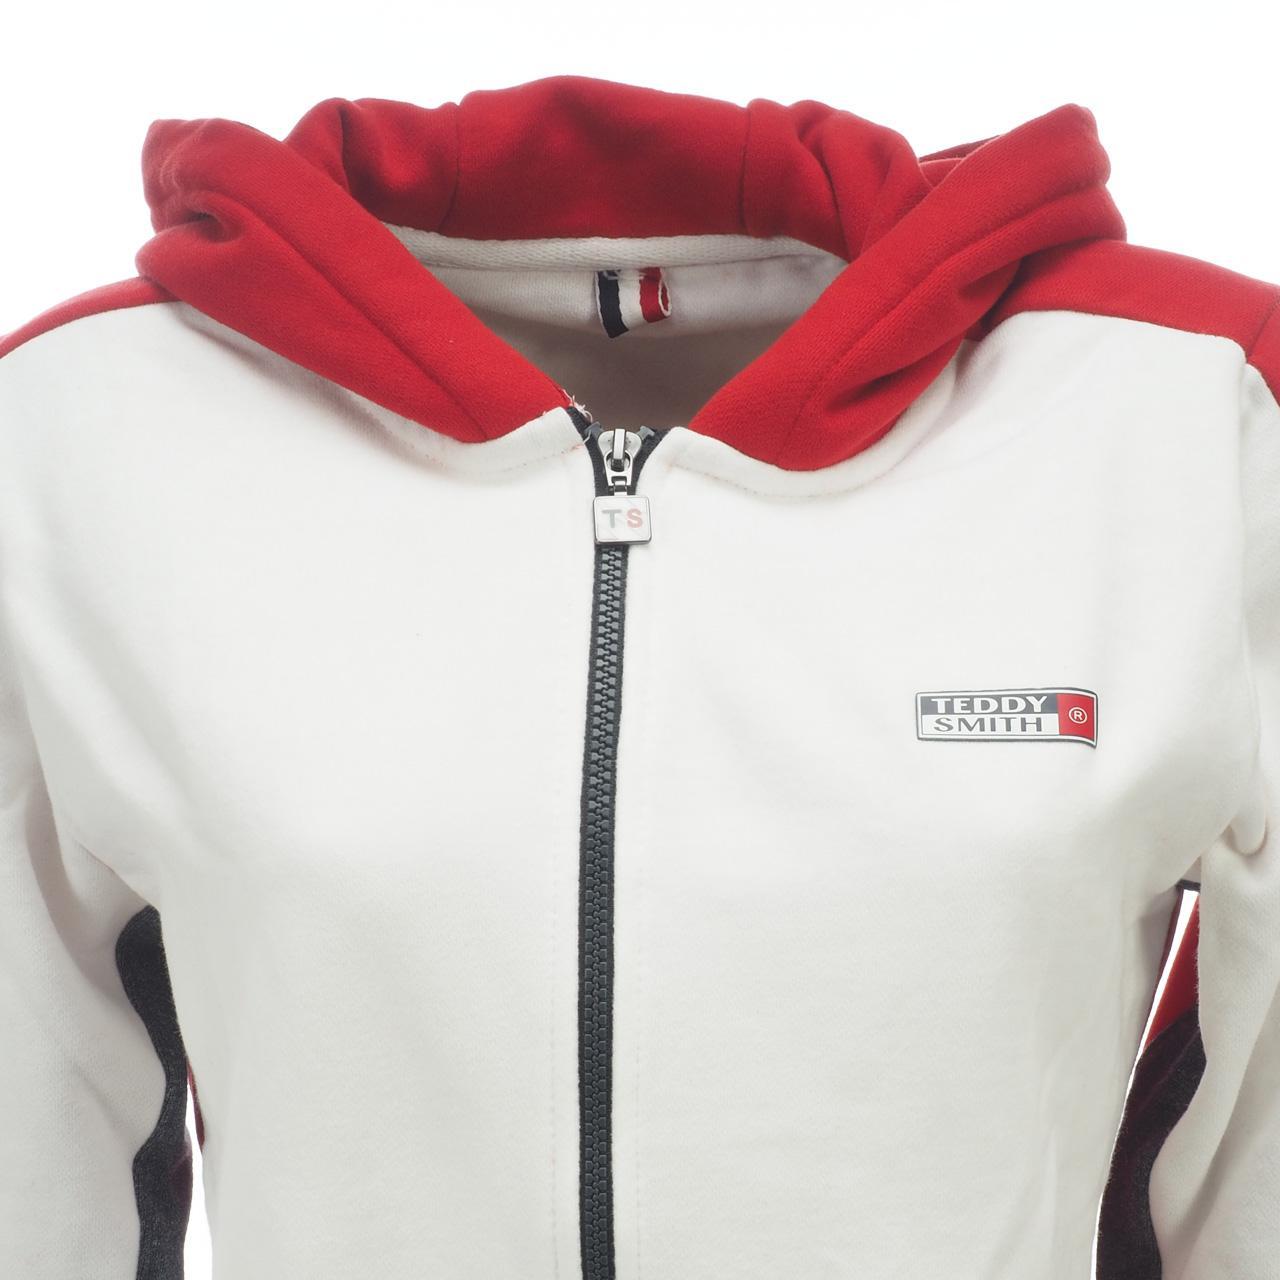 Jacken-Sweatshirts-Zipped-Kapuze-Teddy-Smith-Gafe-Blood-Fz-Umhang-Sw-Jr-Rot Indexbild 4